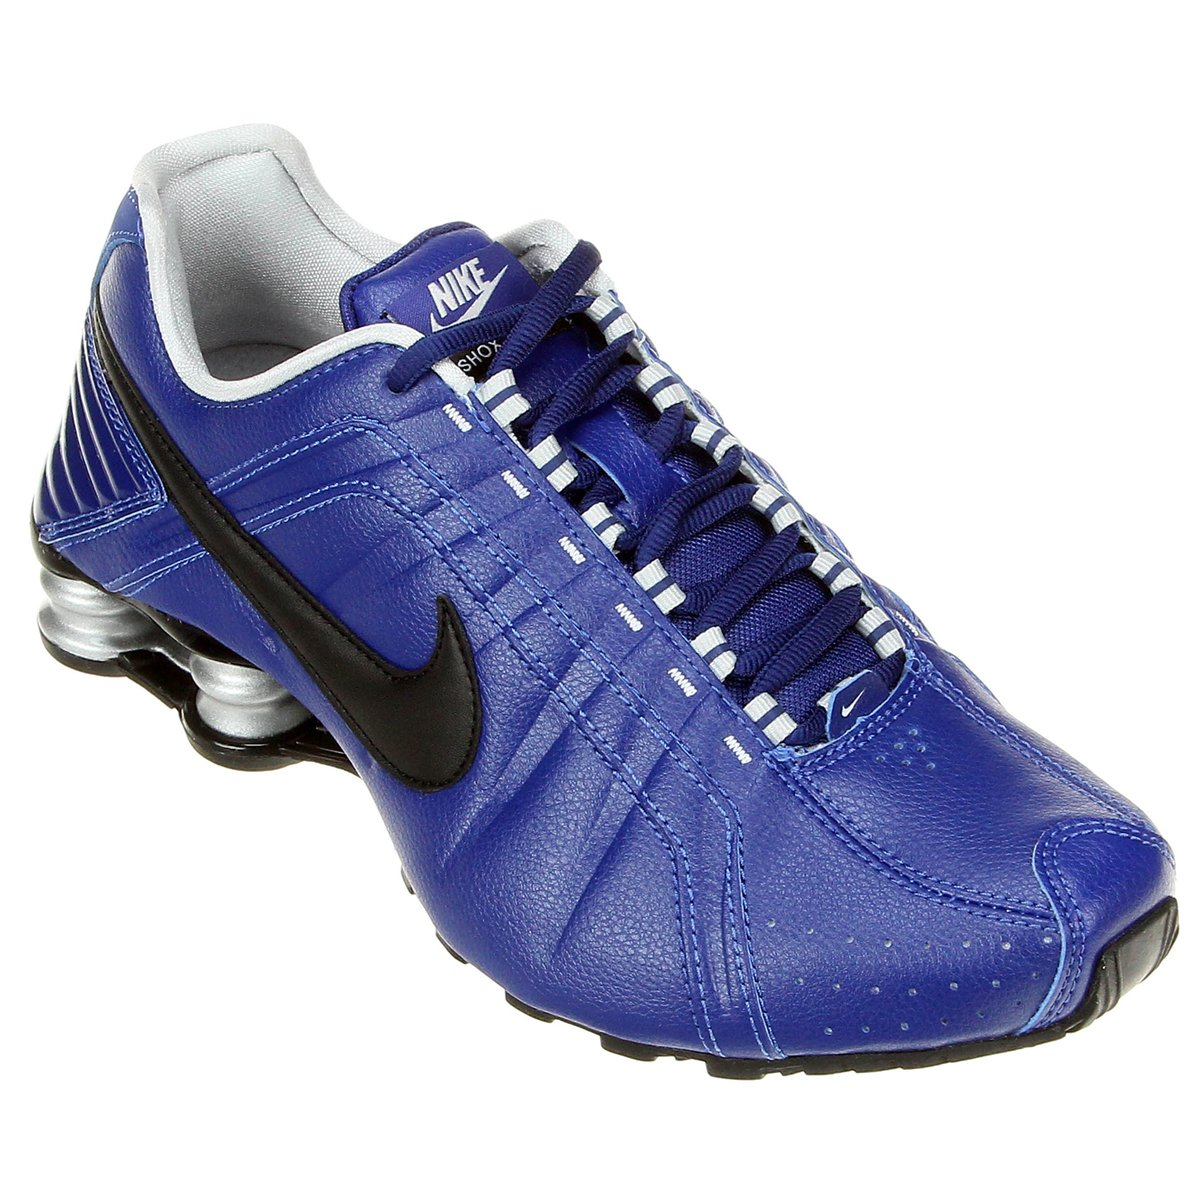 6890408135e ... usa tênis nike shox junior azul escuro 29a42 d2a11